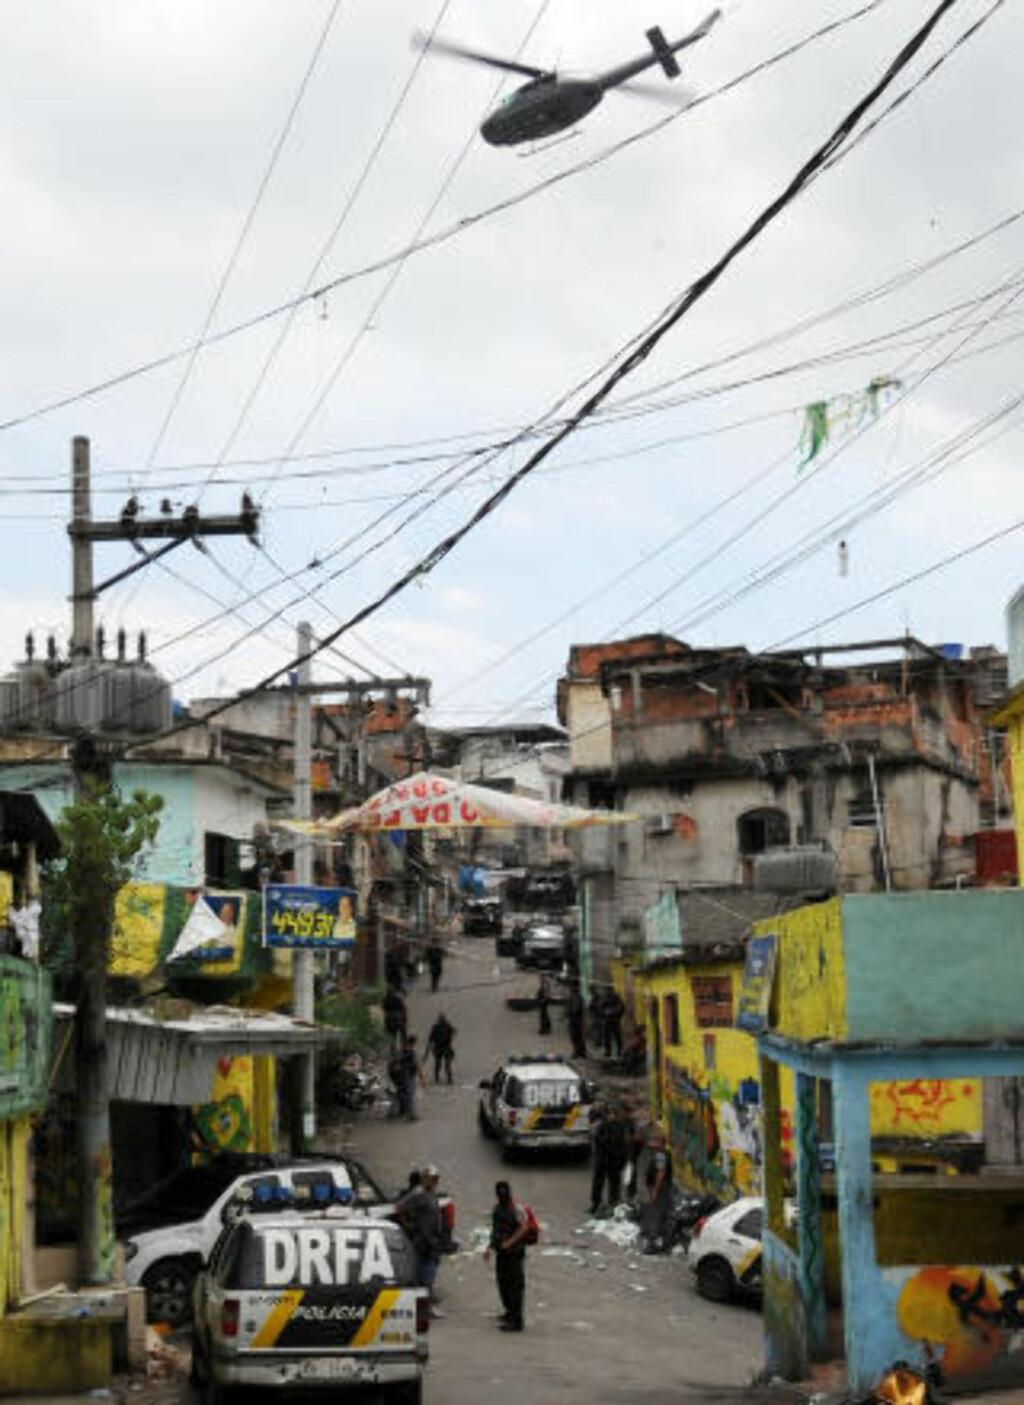 TAR KONTROLL: Politihelikopteret svever i lufta over Vila Cruzeiro-slummen mens politiet tar kontroll over området. Foto: AFP Photo/Evaristo Sa/Scanpix